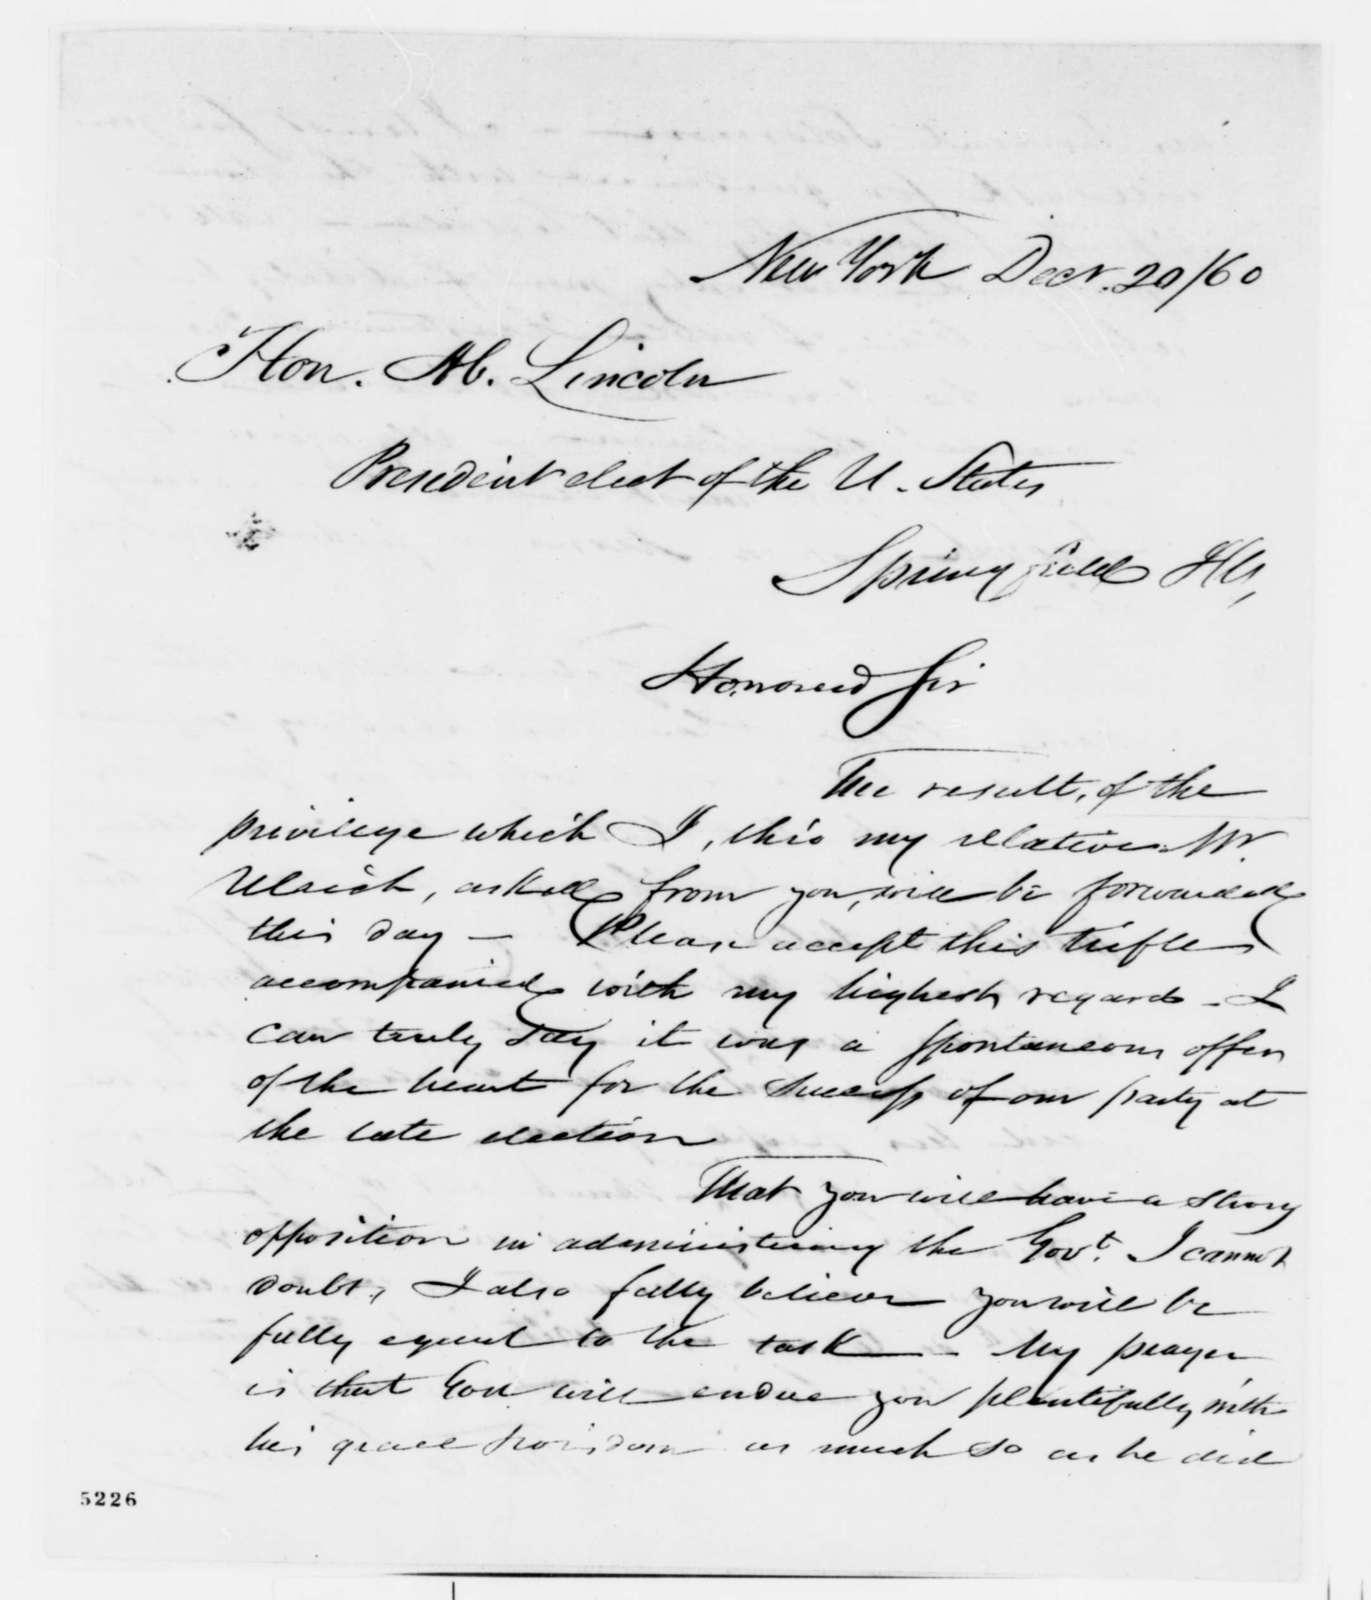 Thomas C. Doremus to Abraham Lincoln, Thursday, December 20, 1860  (Sends gifts)